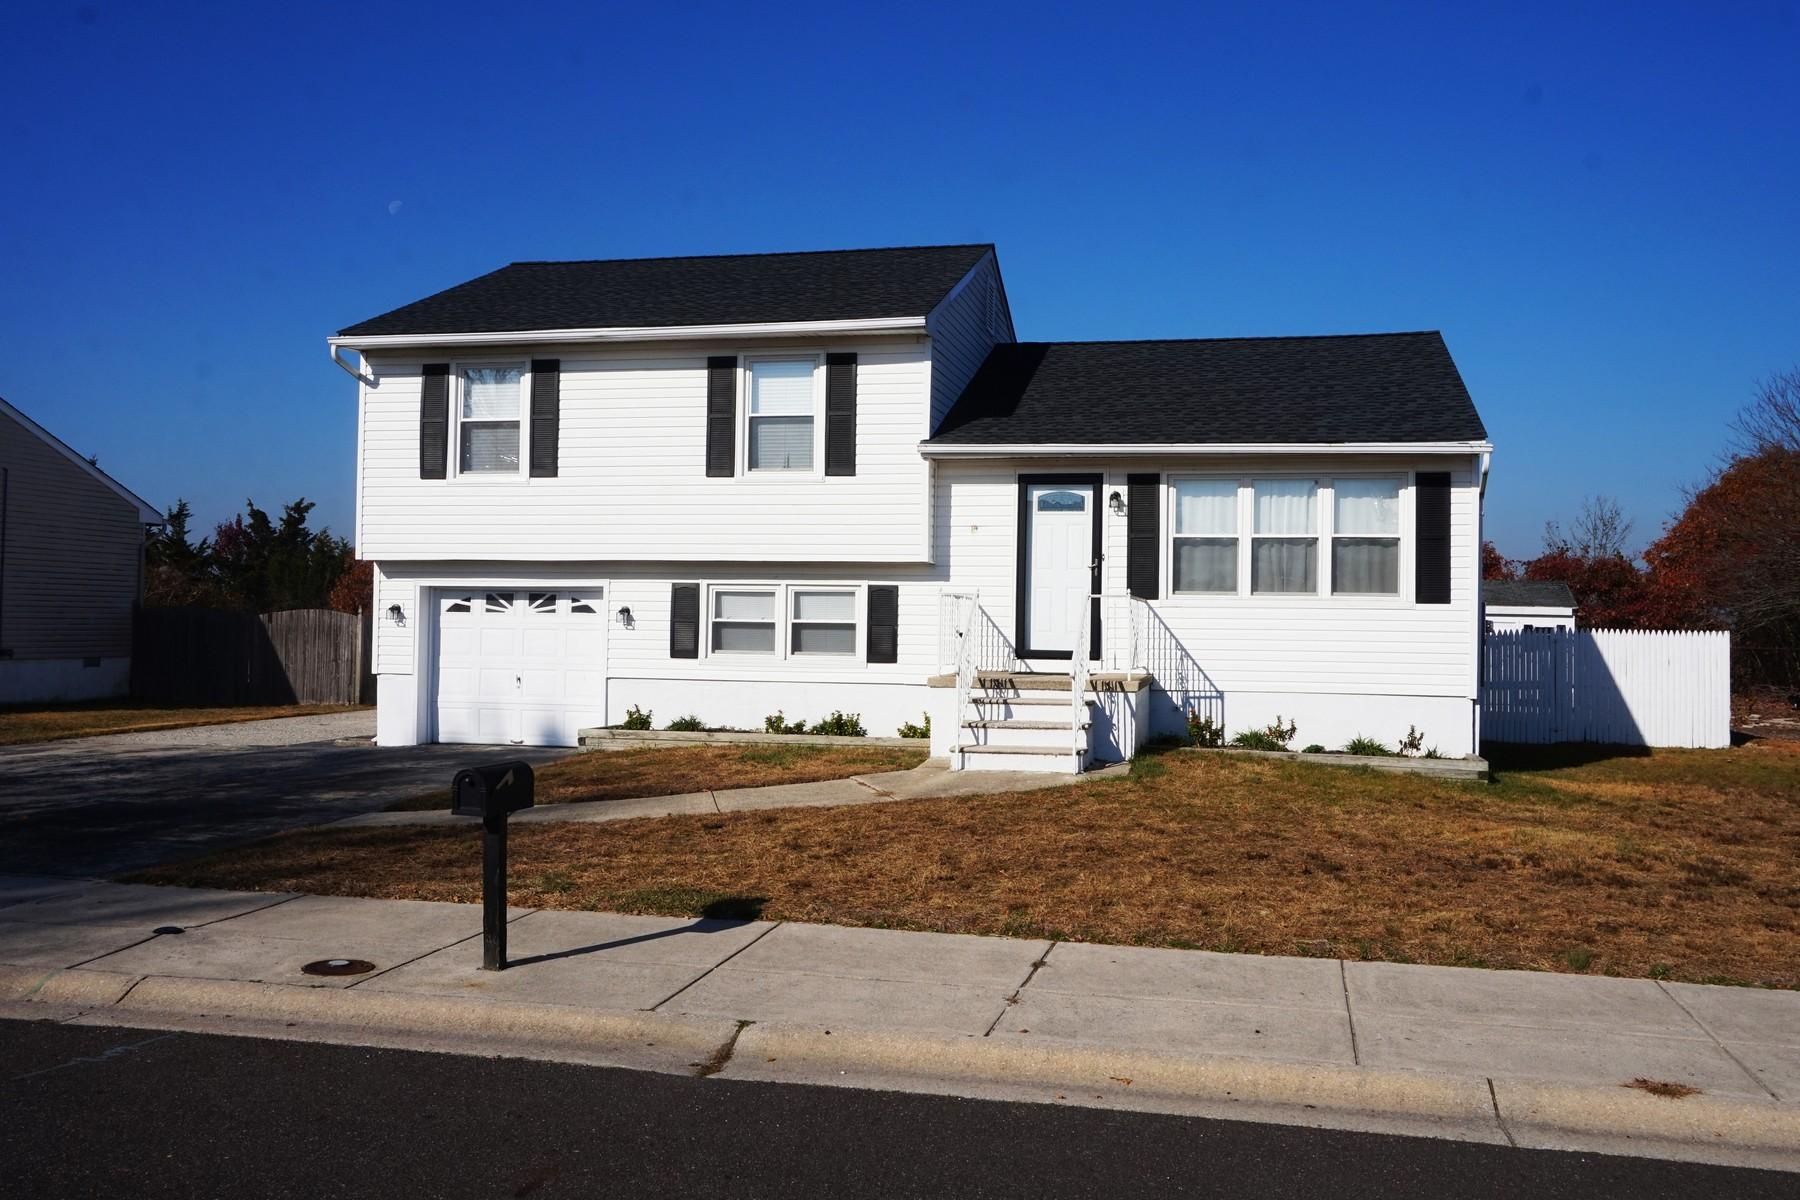 独户住宅 为 销售 在 Move In Ready 55 Bucknell Road Somers Point, 08244 美国